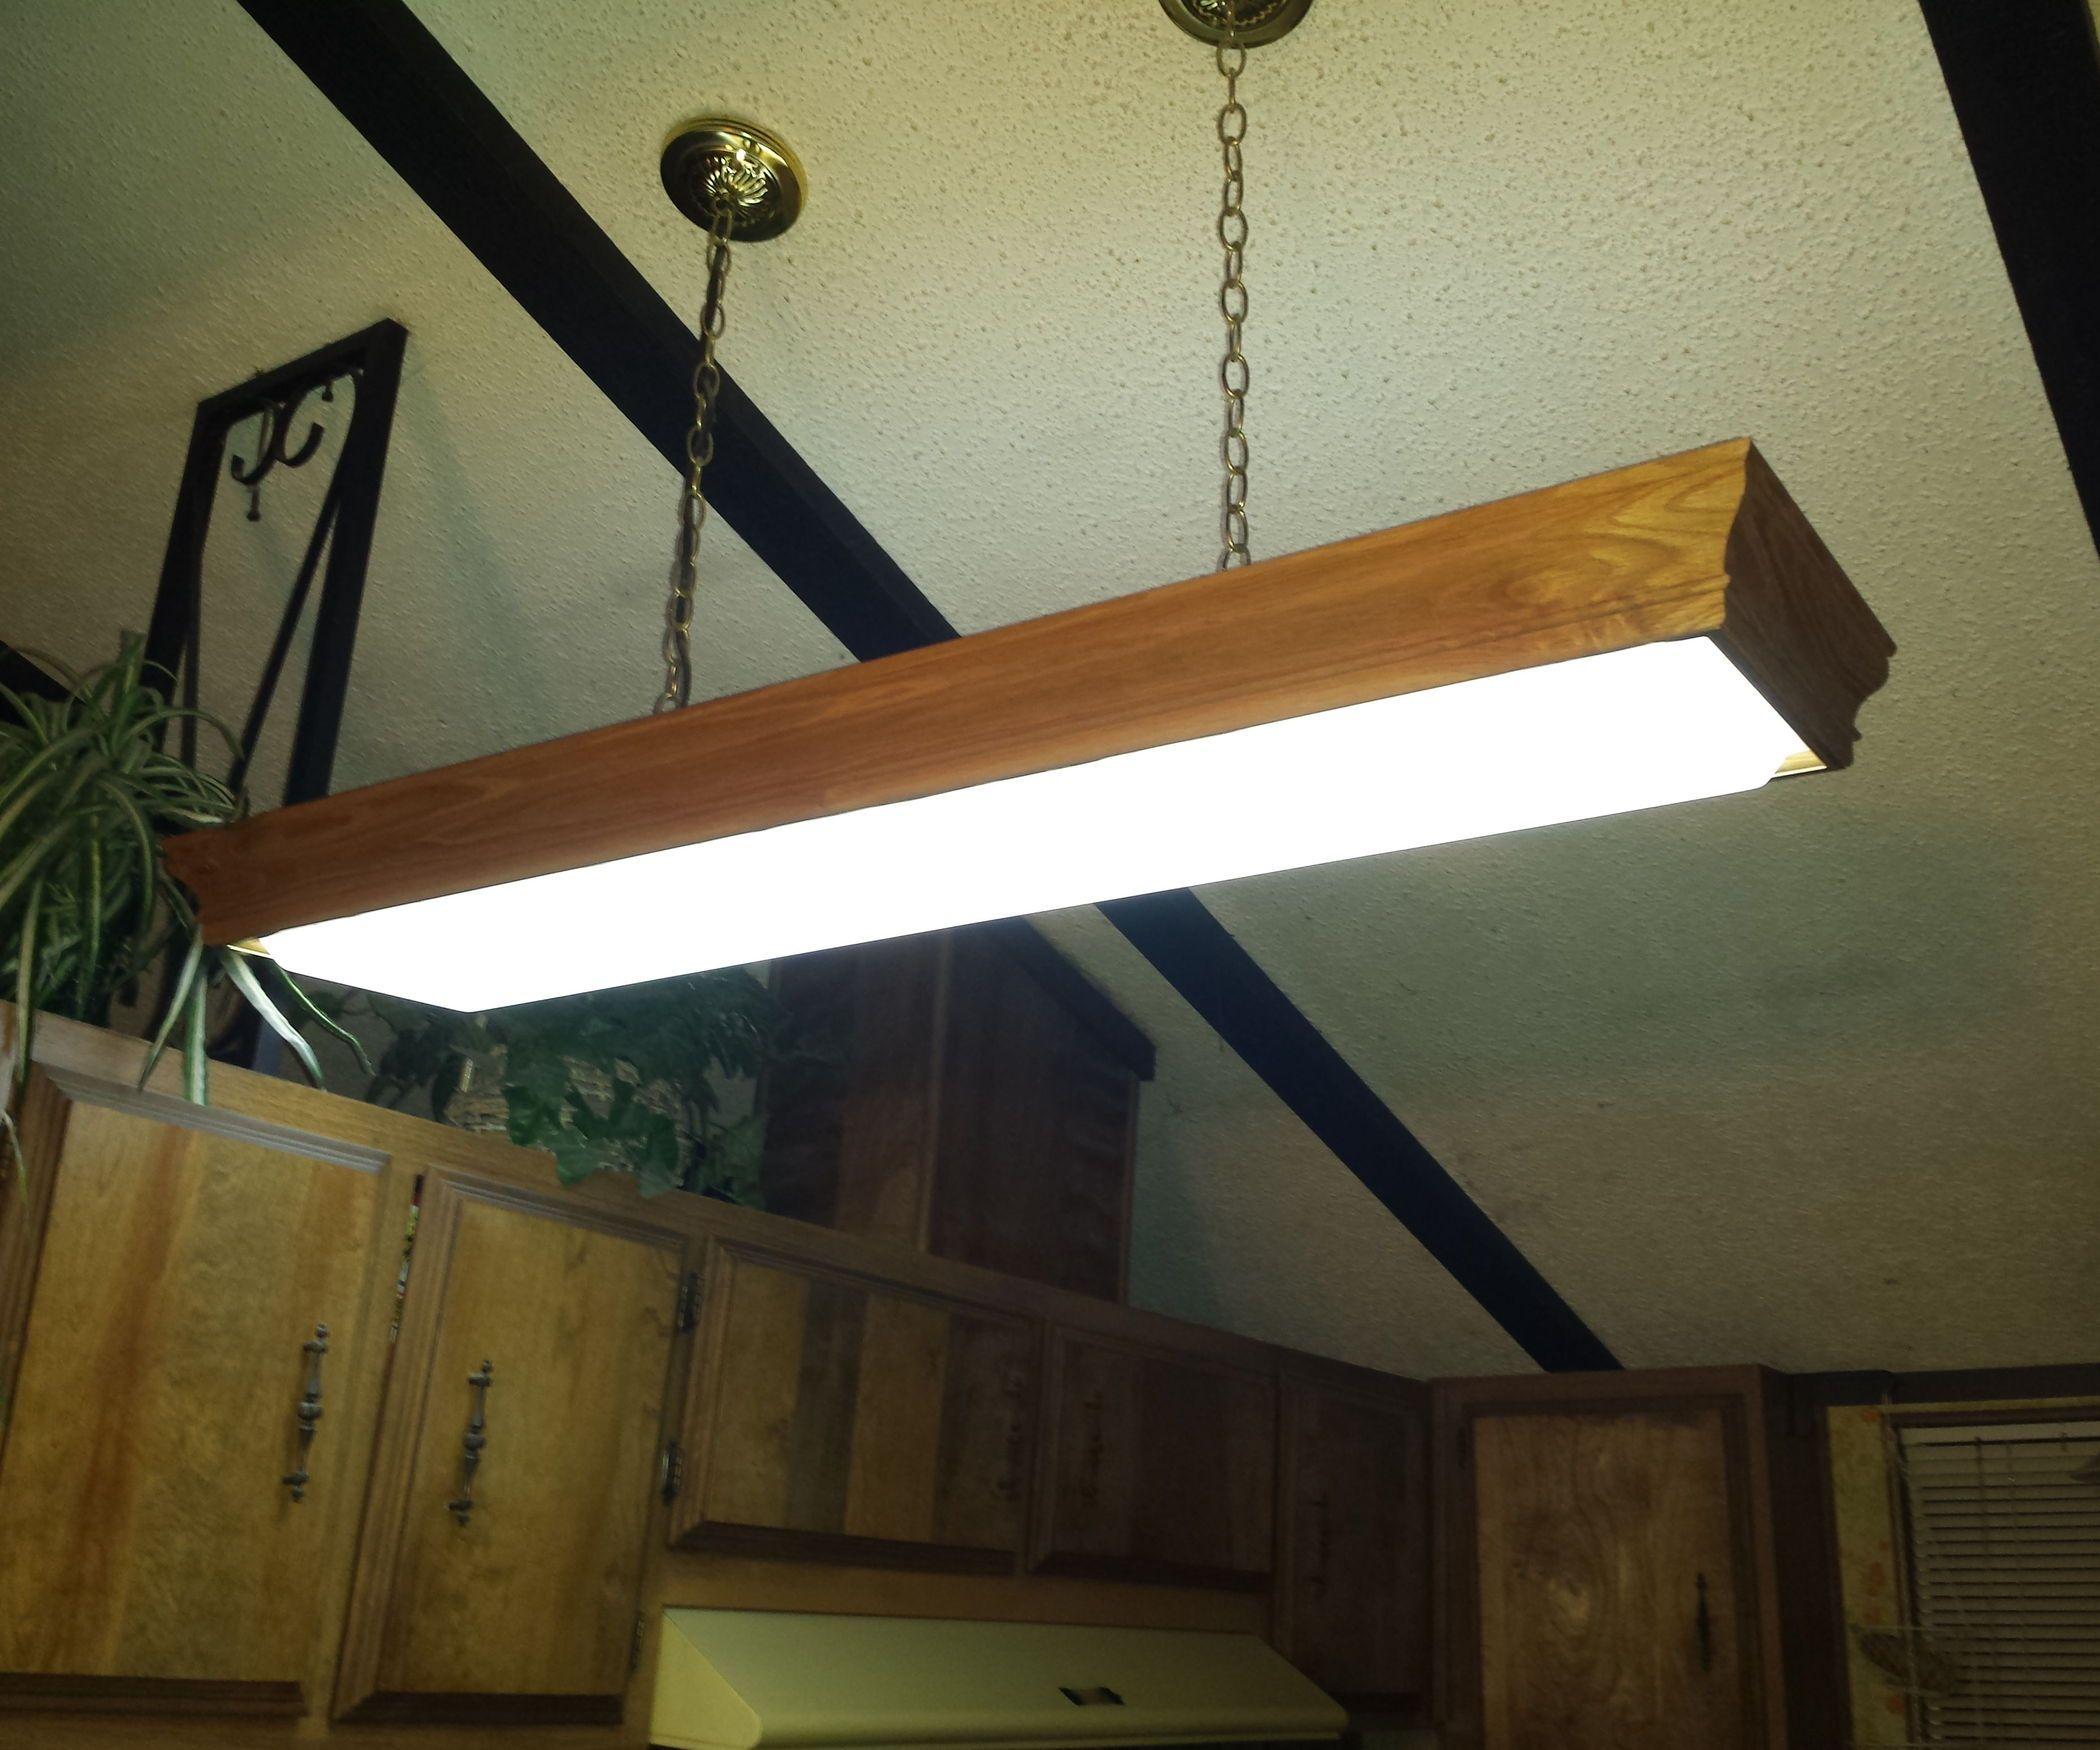 Fluorescent to LED Conversion Under $30 | Diys